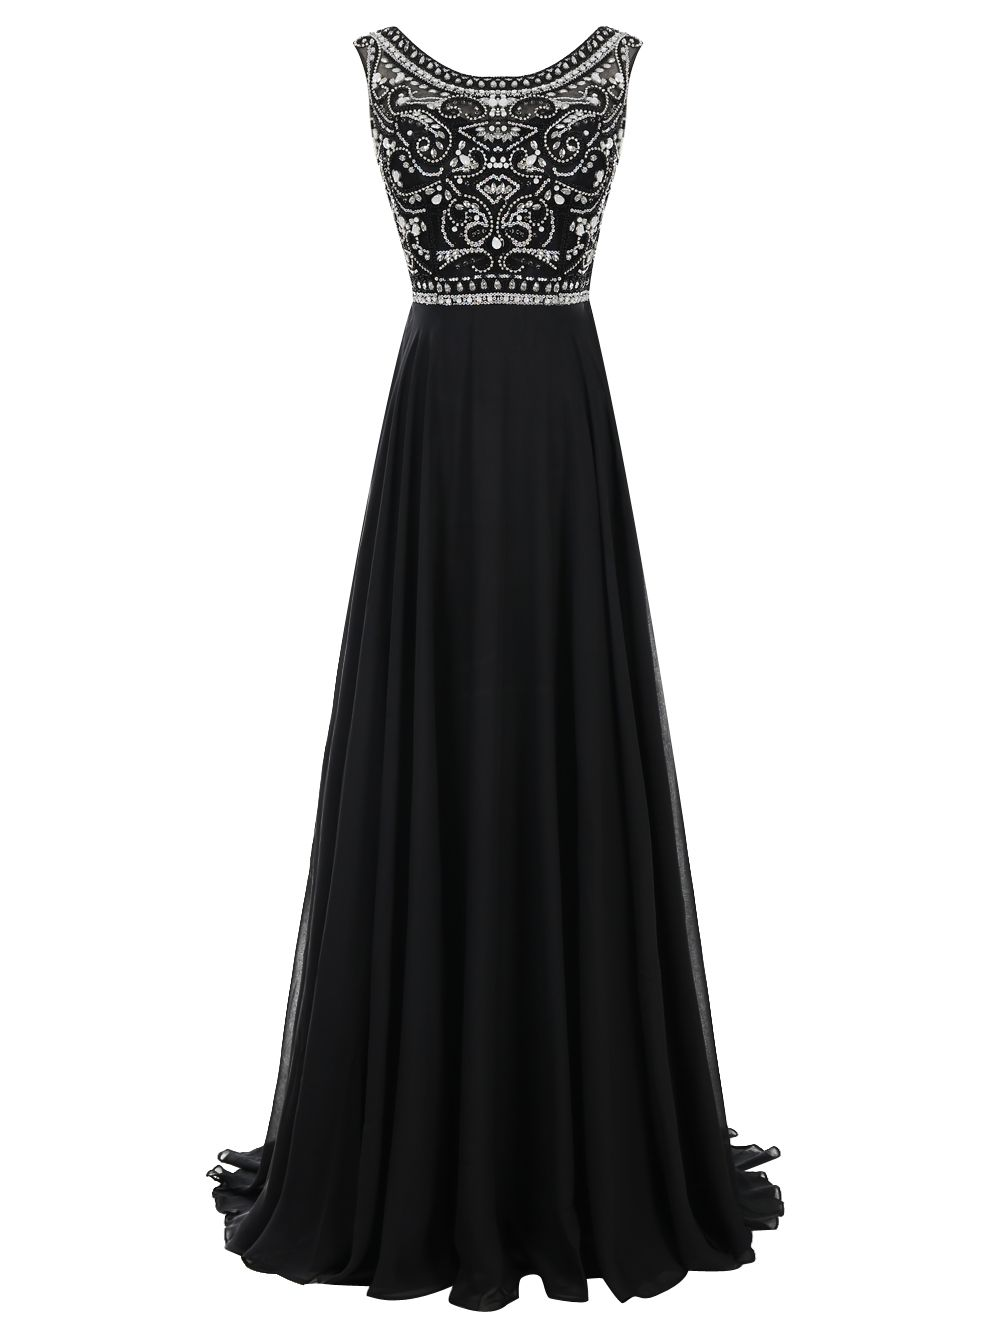 Decent Black Prom Dress Bateau Sleeveless Sweep Train Pleated Beading With Rhinestones Prom Dresses Plus Prom Dresses Hot Prom Dress [ 1320 x 1005 Pixel ]